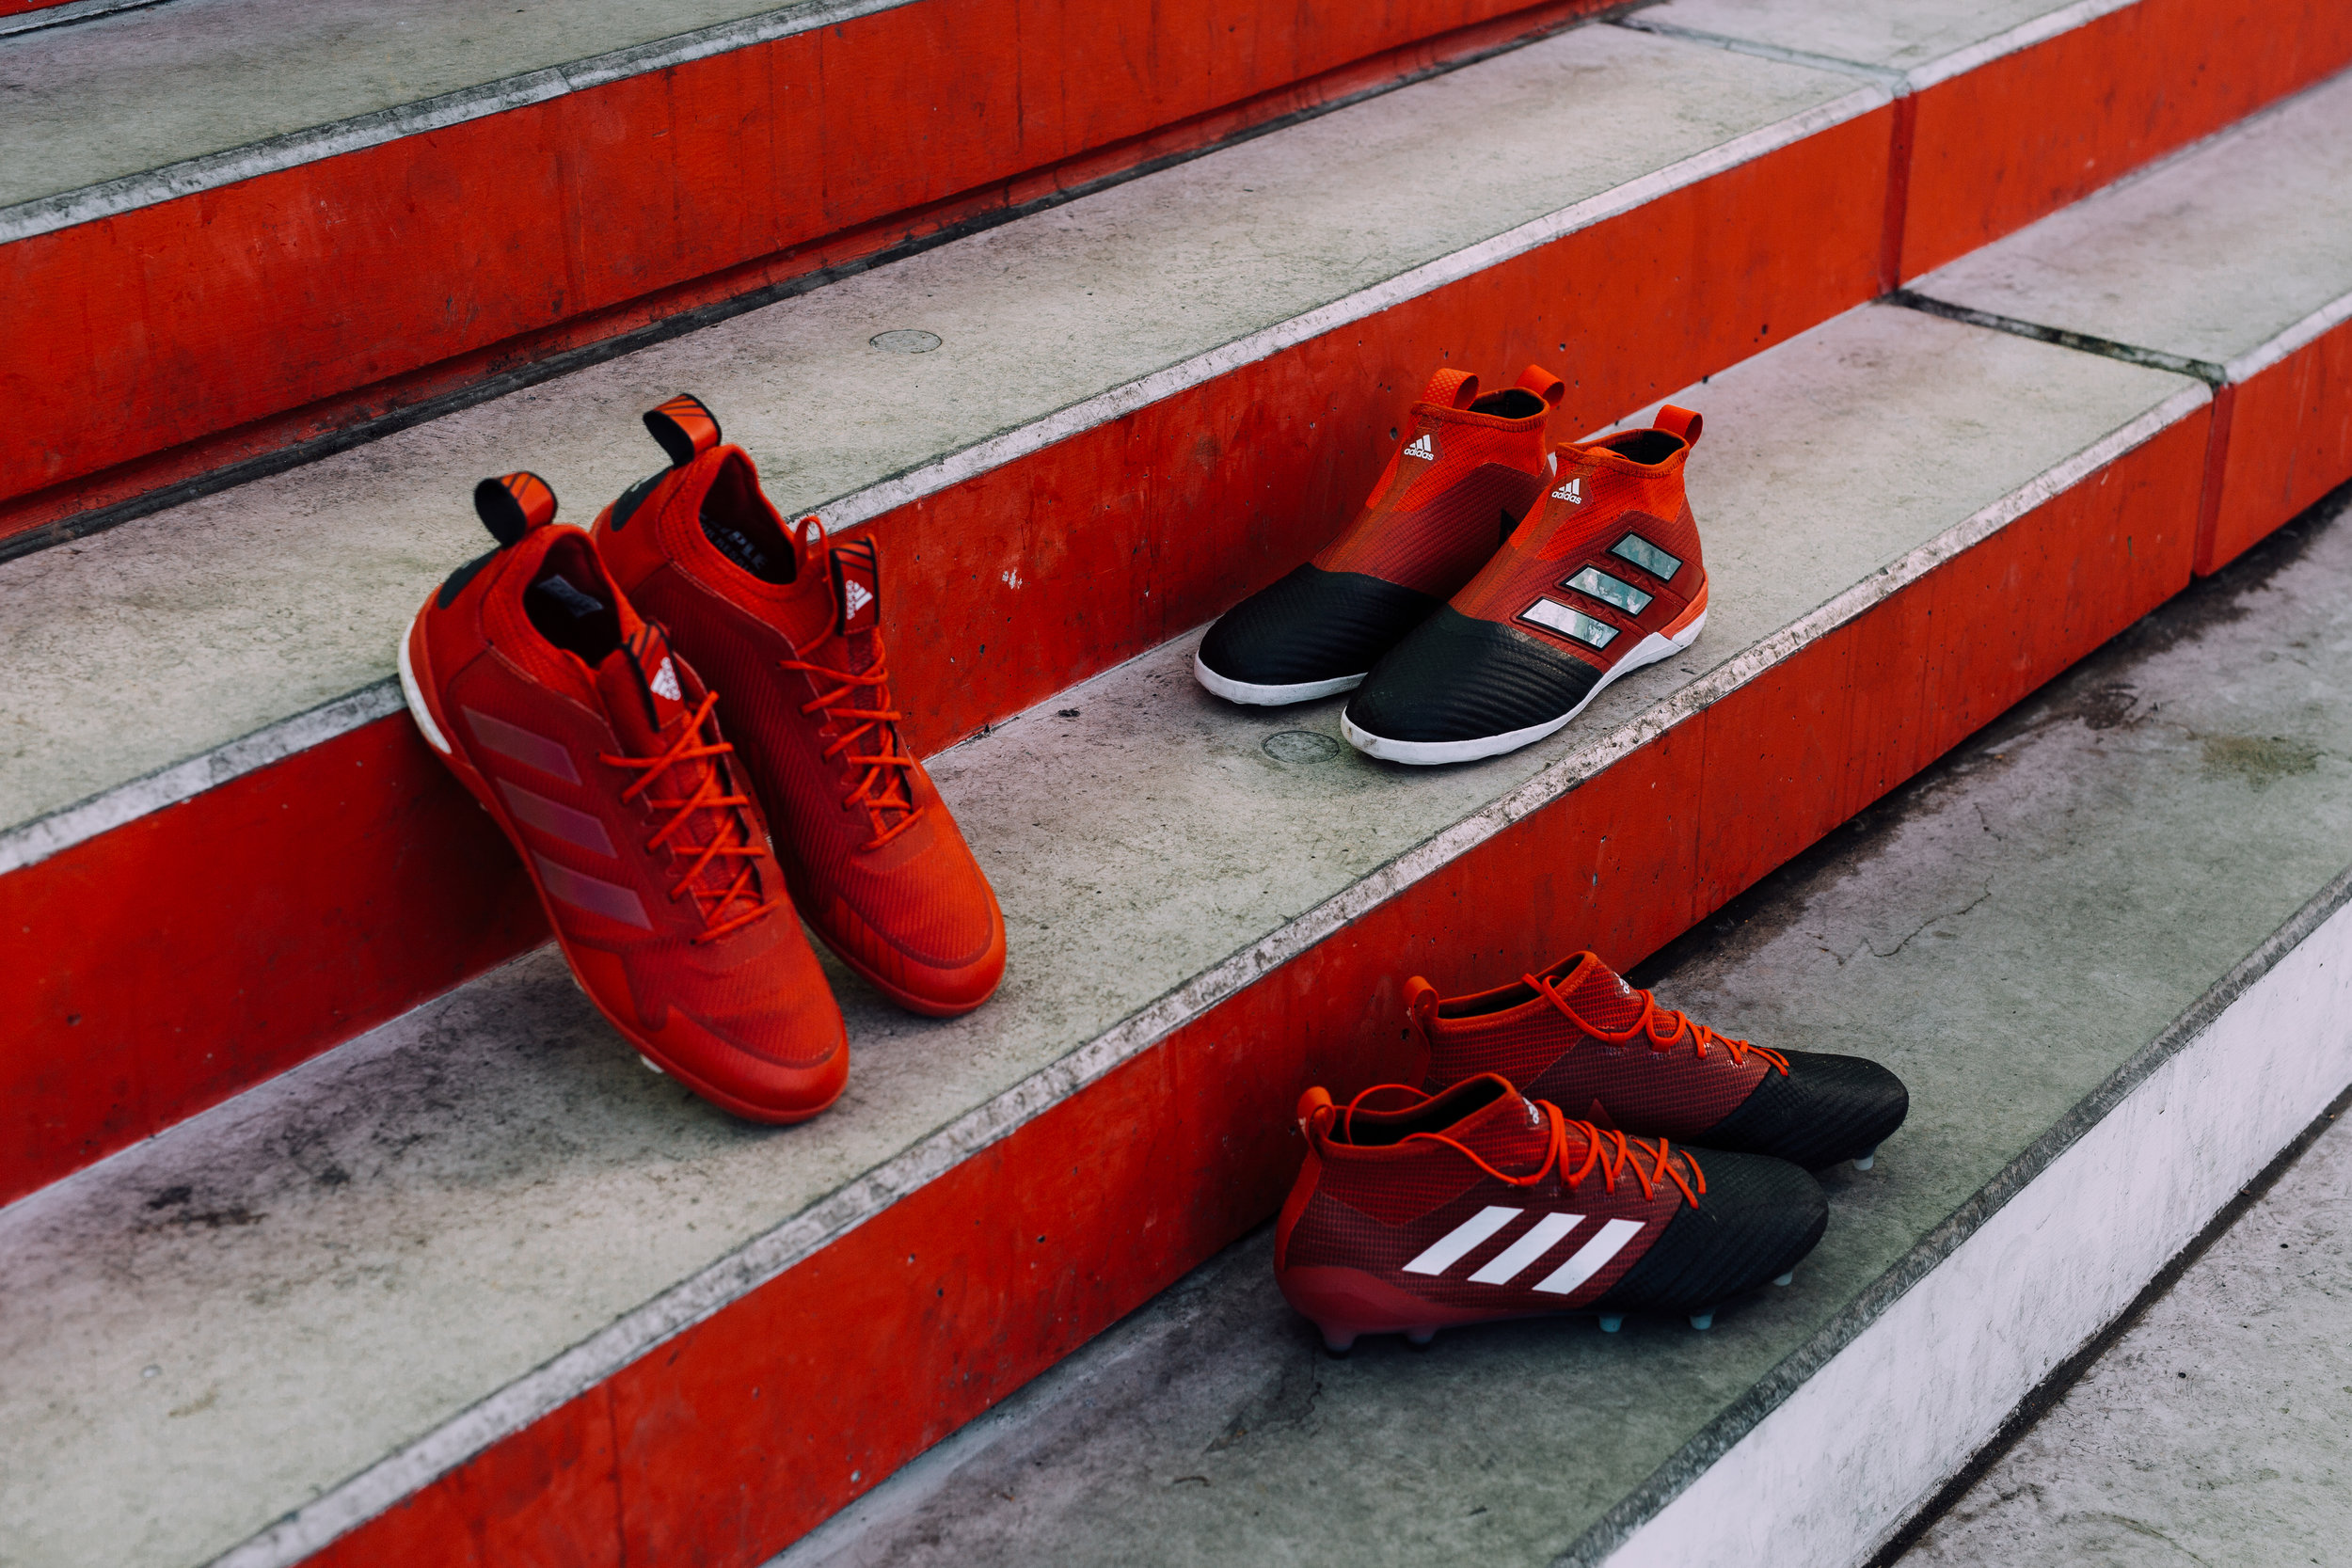 fotoshooting-wien-adidas-fotograf-constant-evolution.jpg